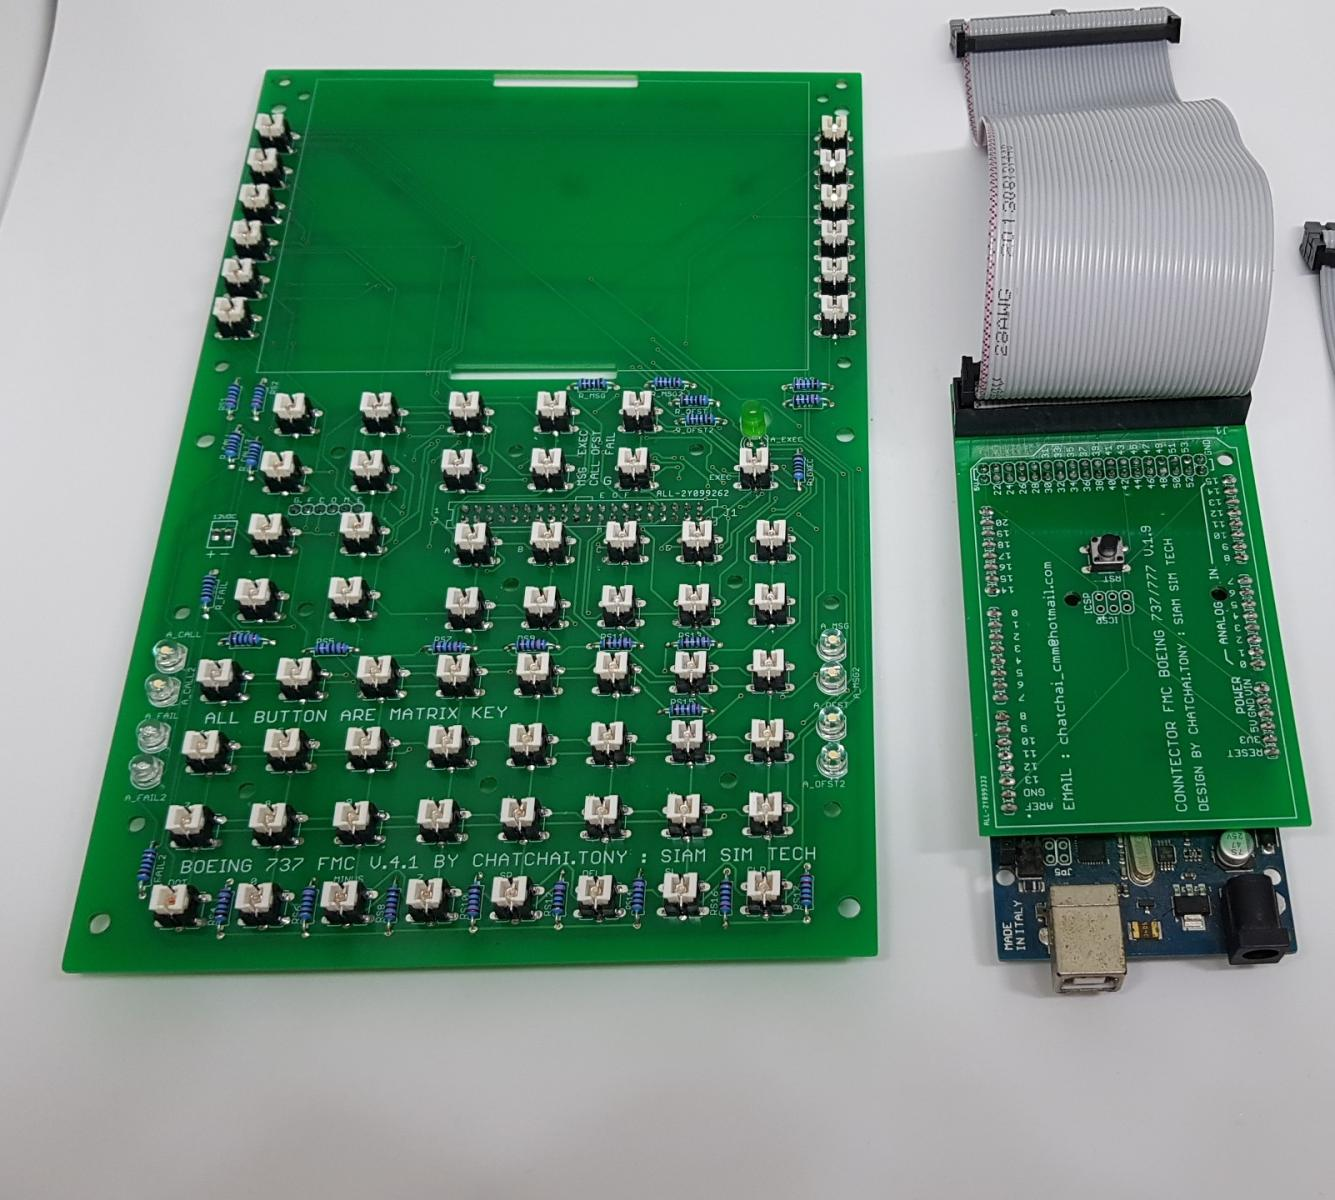 Possible to make FMC by arduino board - ZIBO B738-800